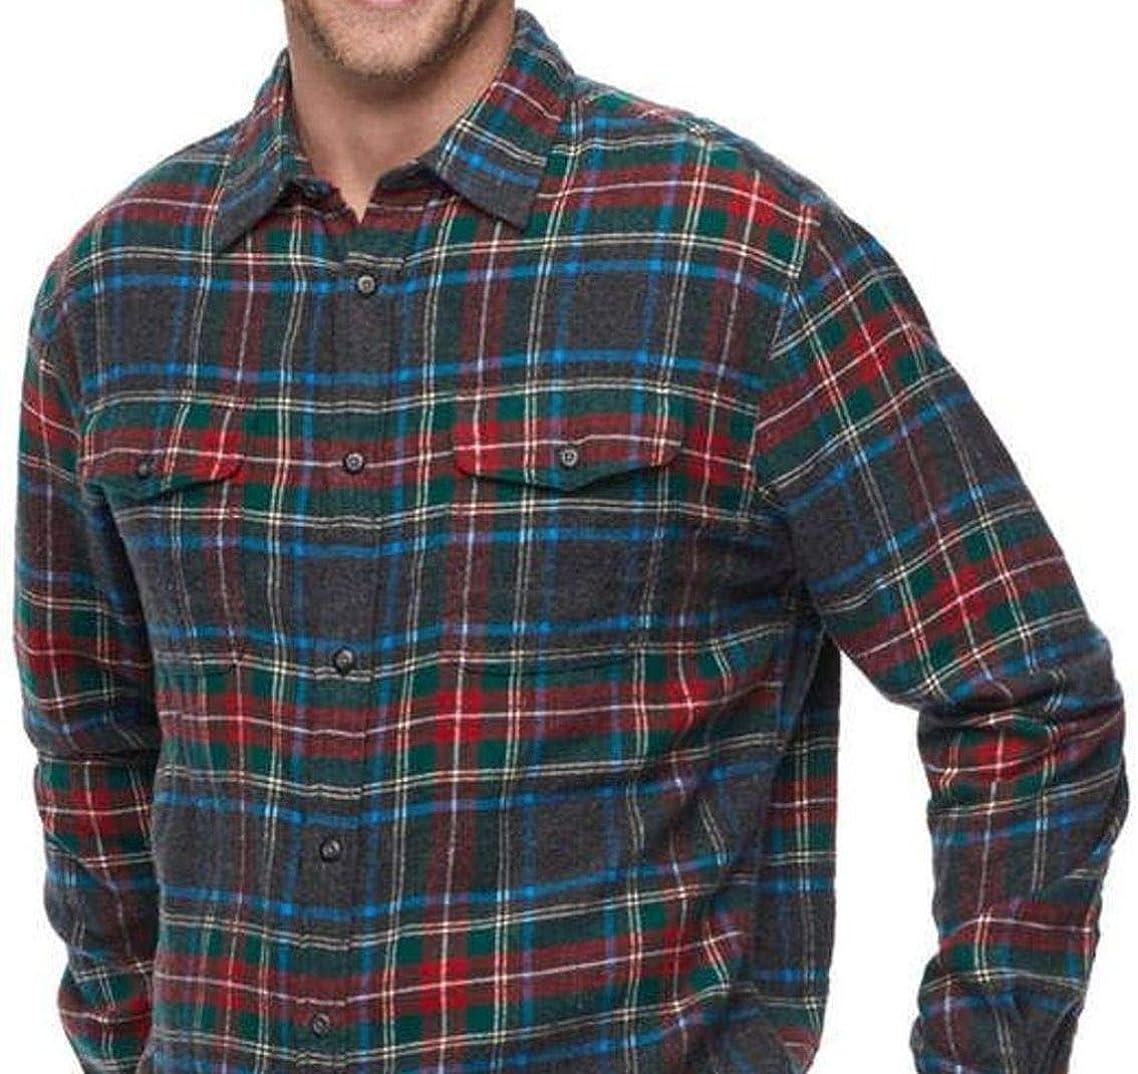 Sonoma Mens Classic Fit Soft Flannel Shirt Red Blue Tartan Plaid